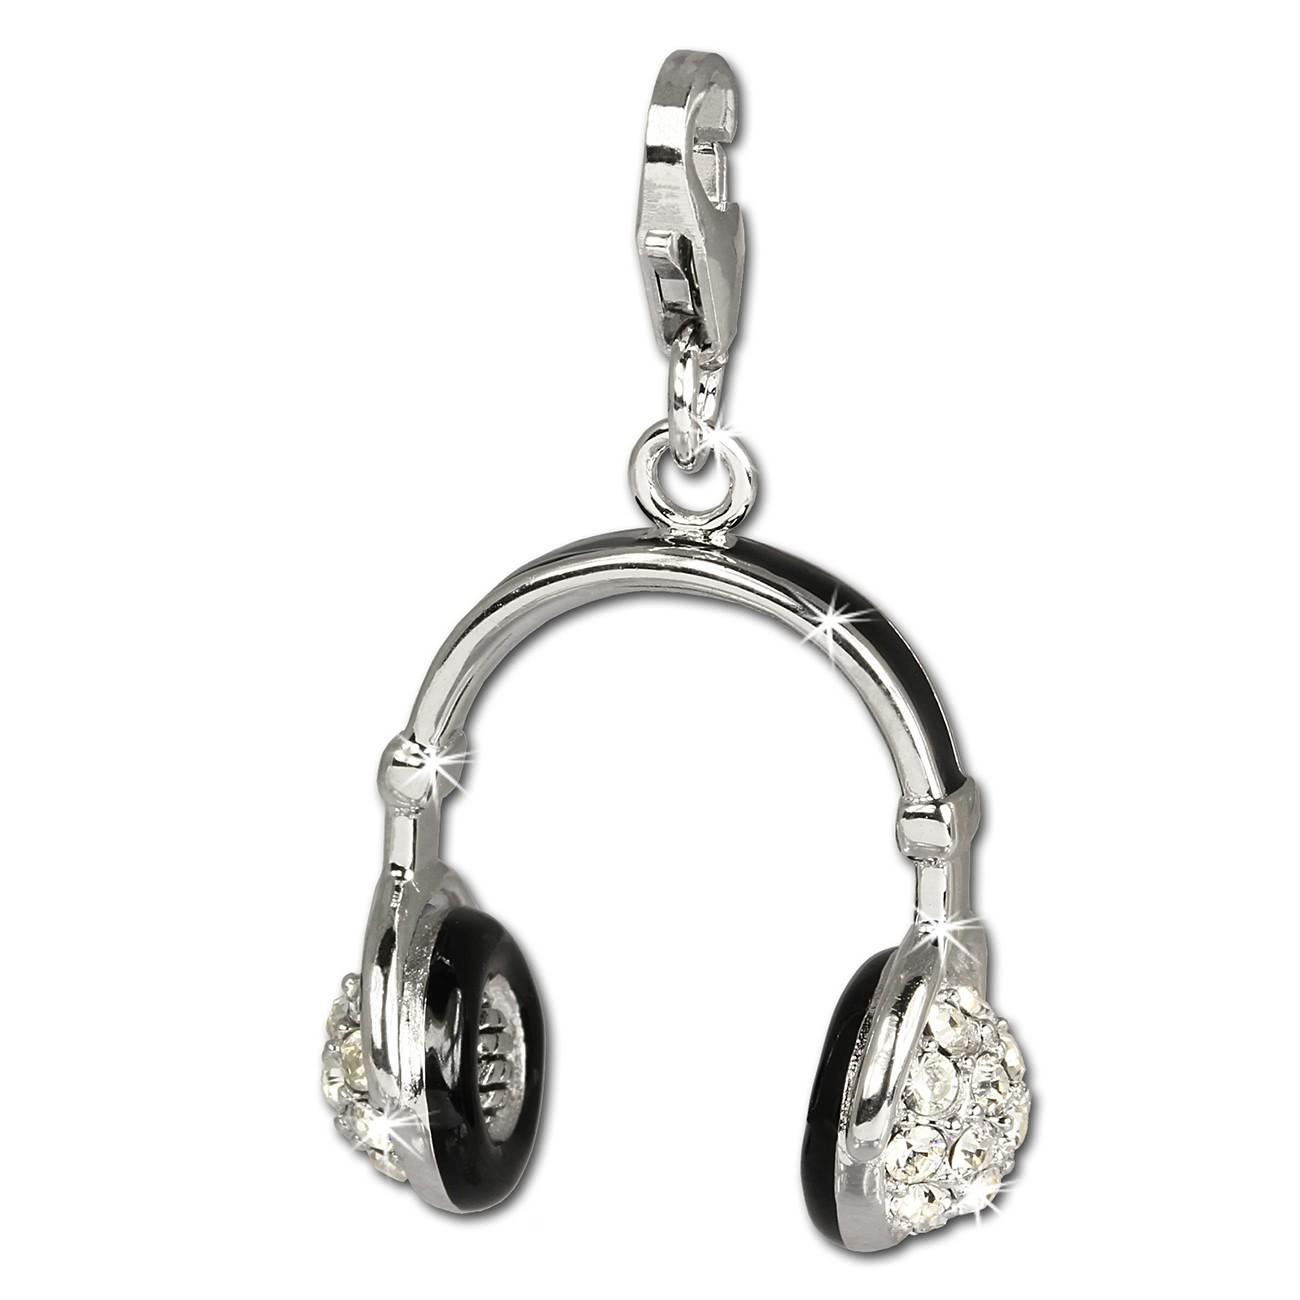 SilberDream Charm Kopfhörer Zirkonia 925 Silber Armband Anhänger FC658